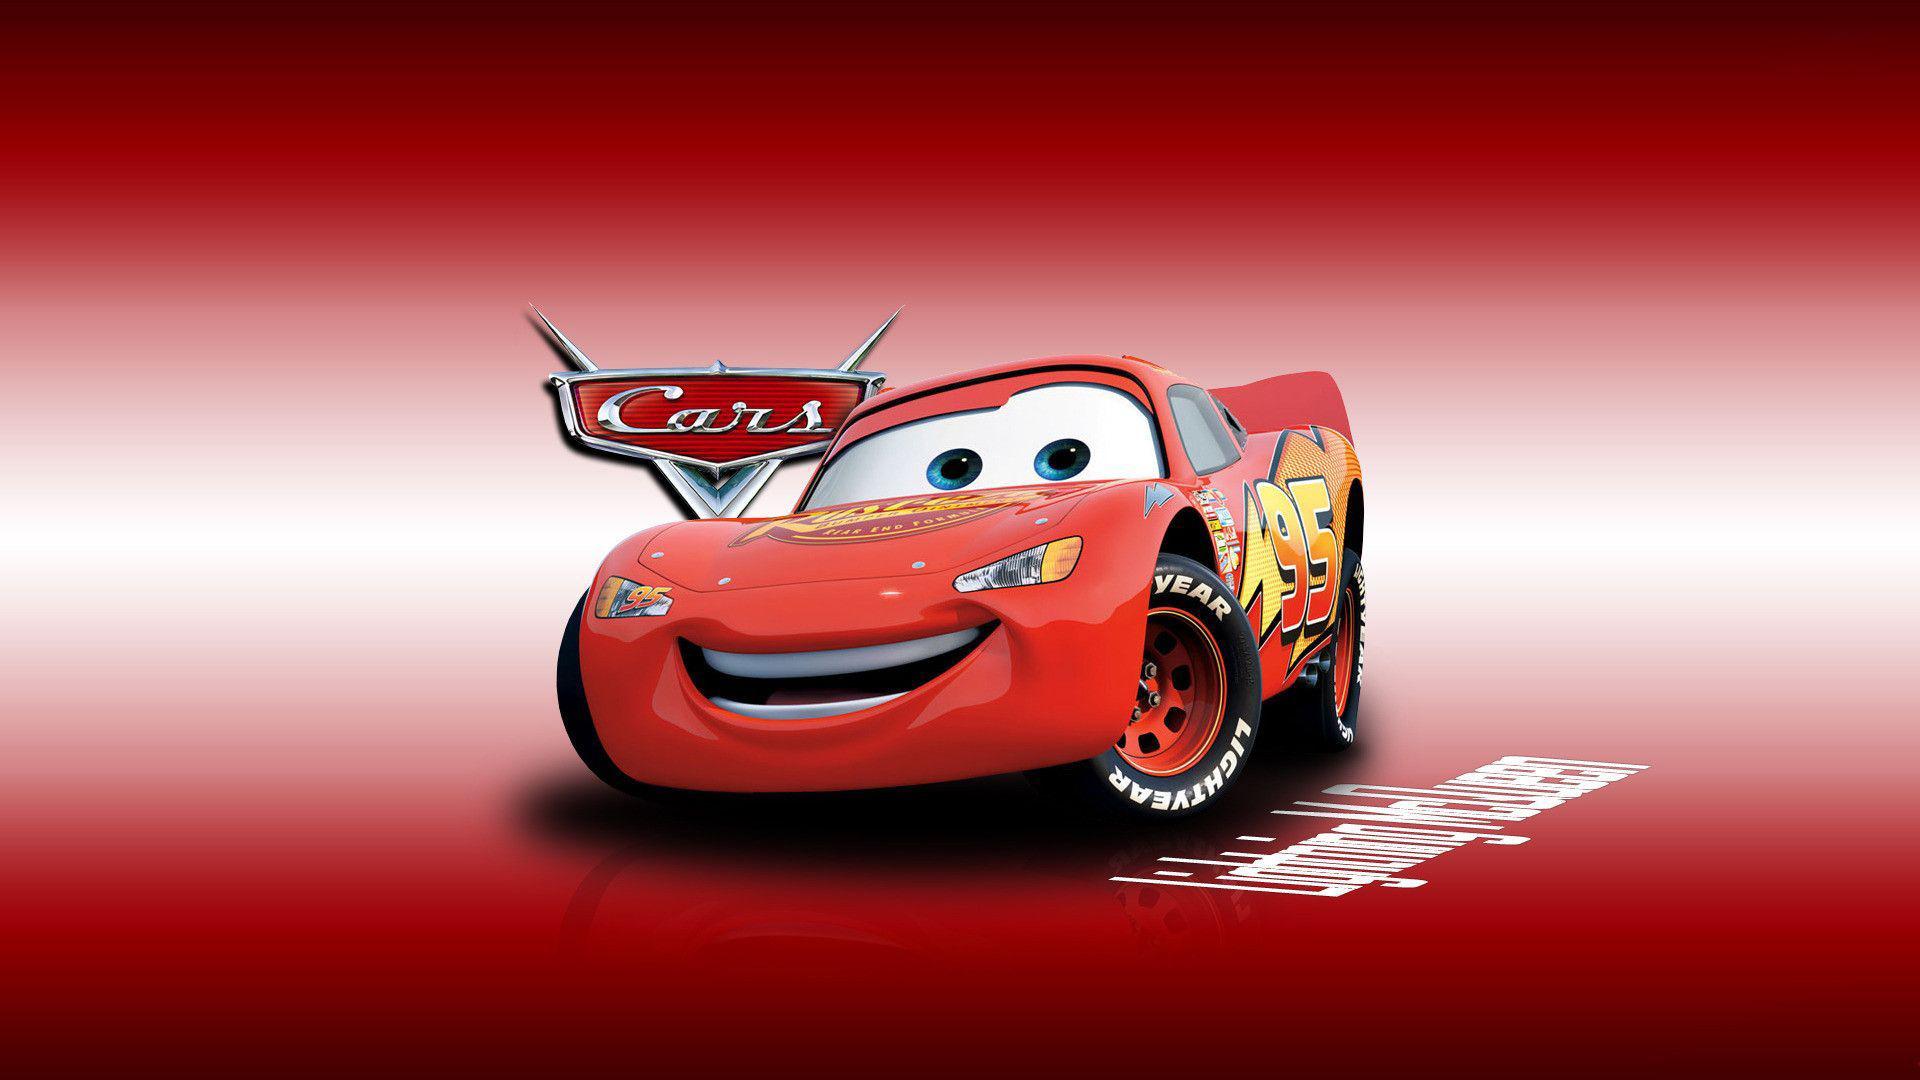 Disney Cars PNG HD Free - 143308